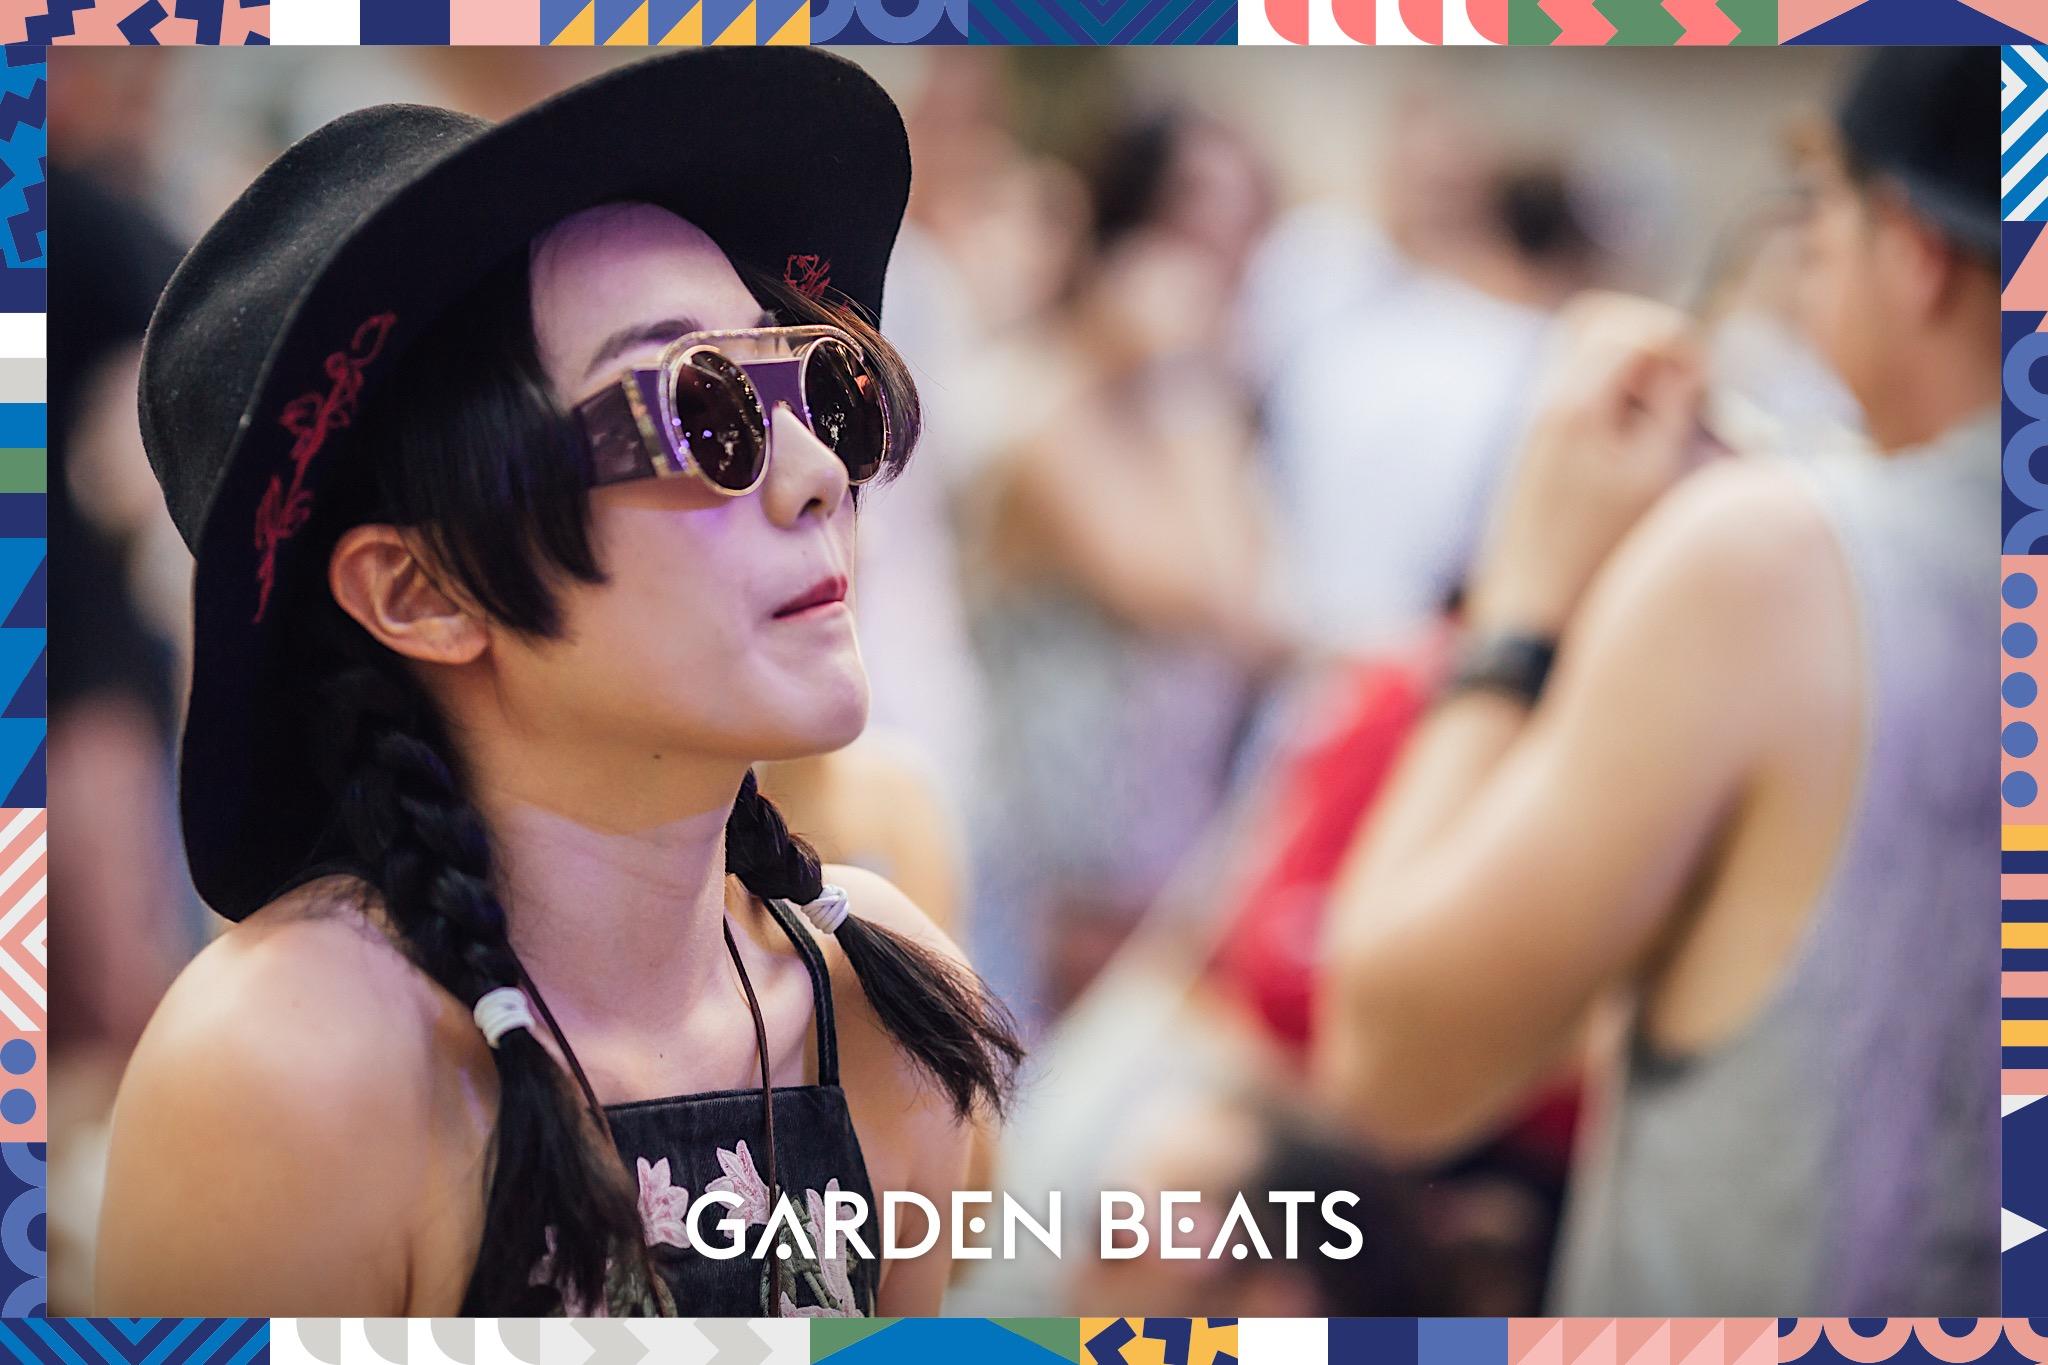 18032017_GardenBeats_Colossal594_WatermarkedGB.jpg